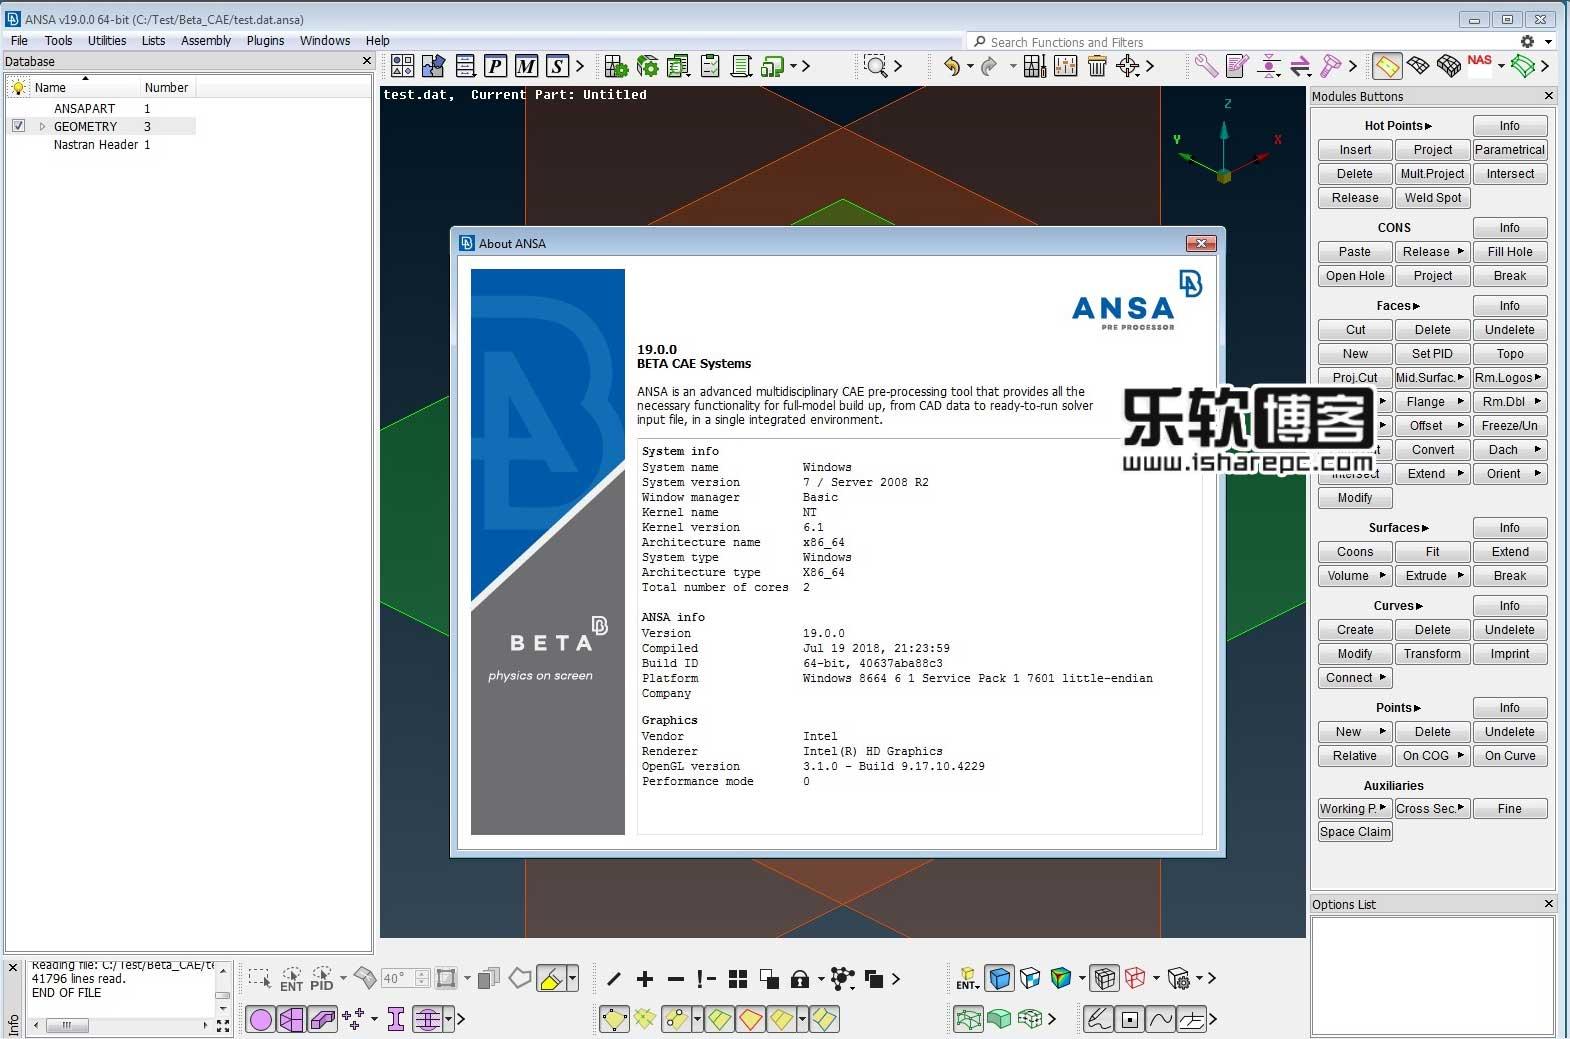 BETA-CAE Systems 19.0.0破解版